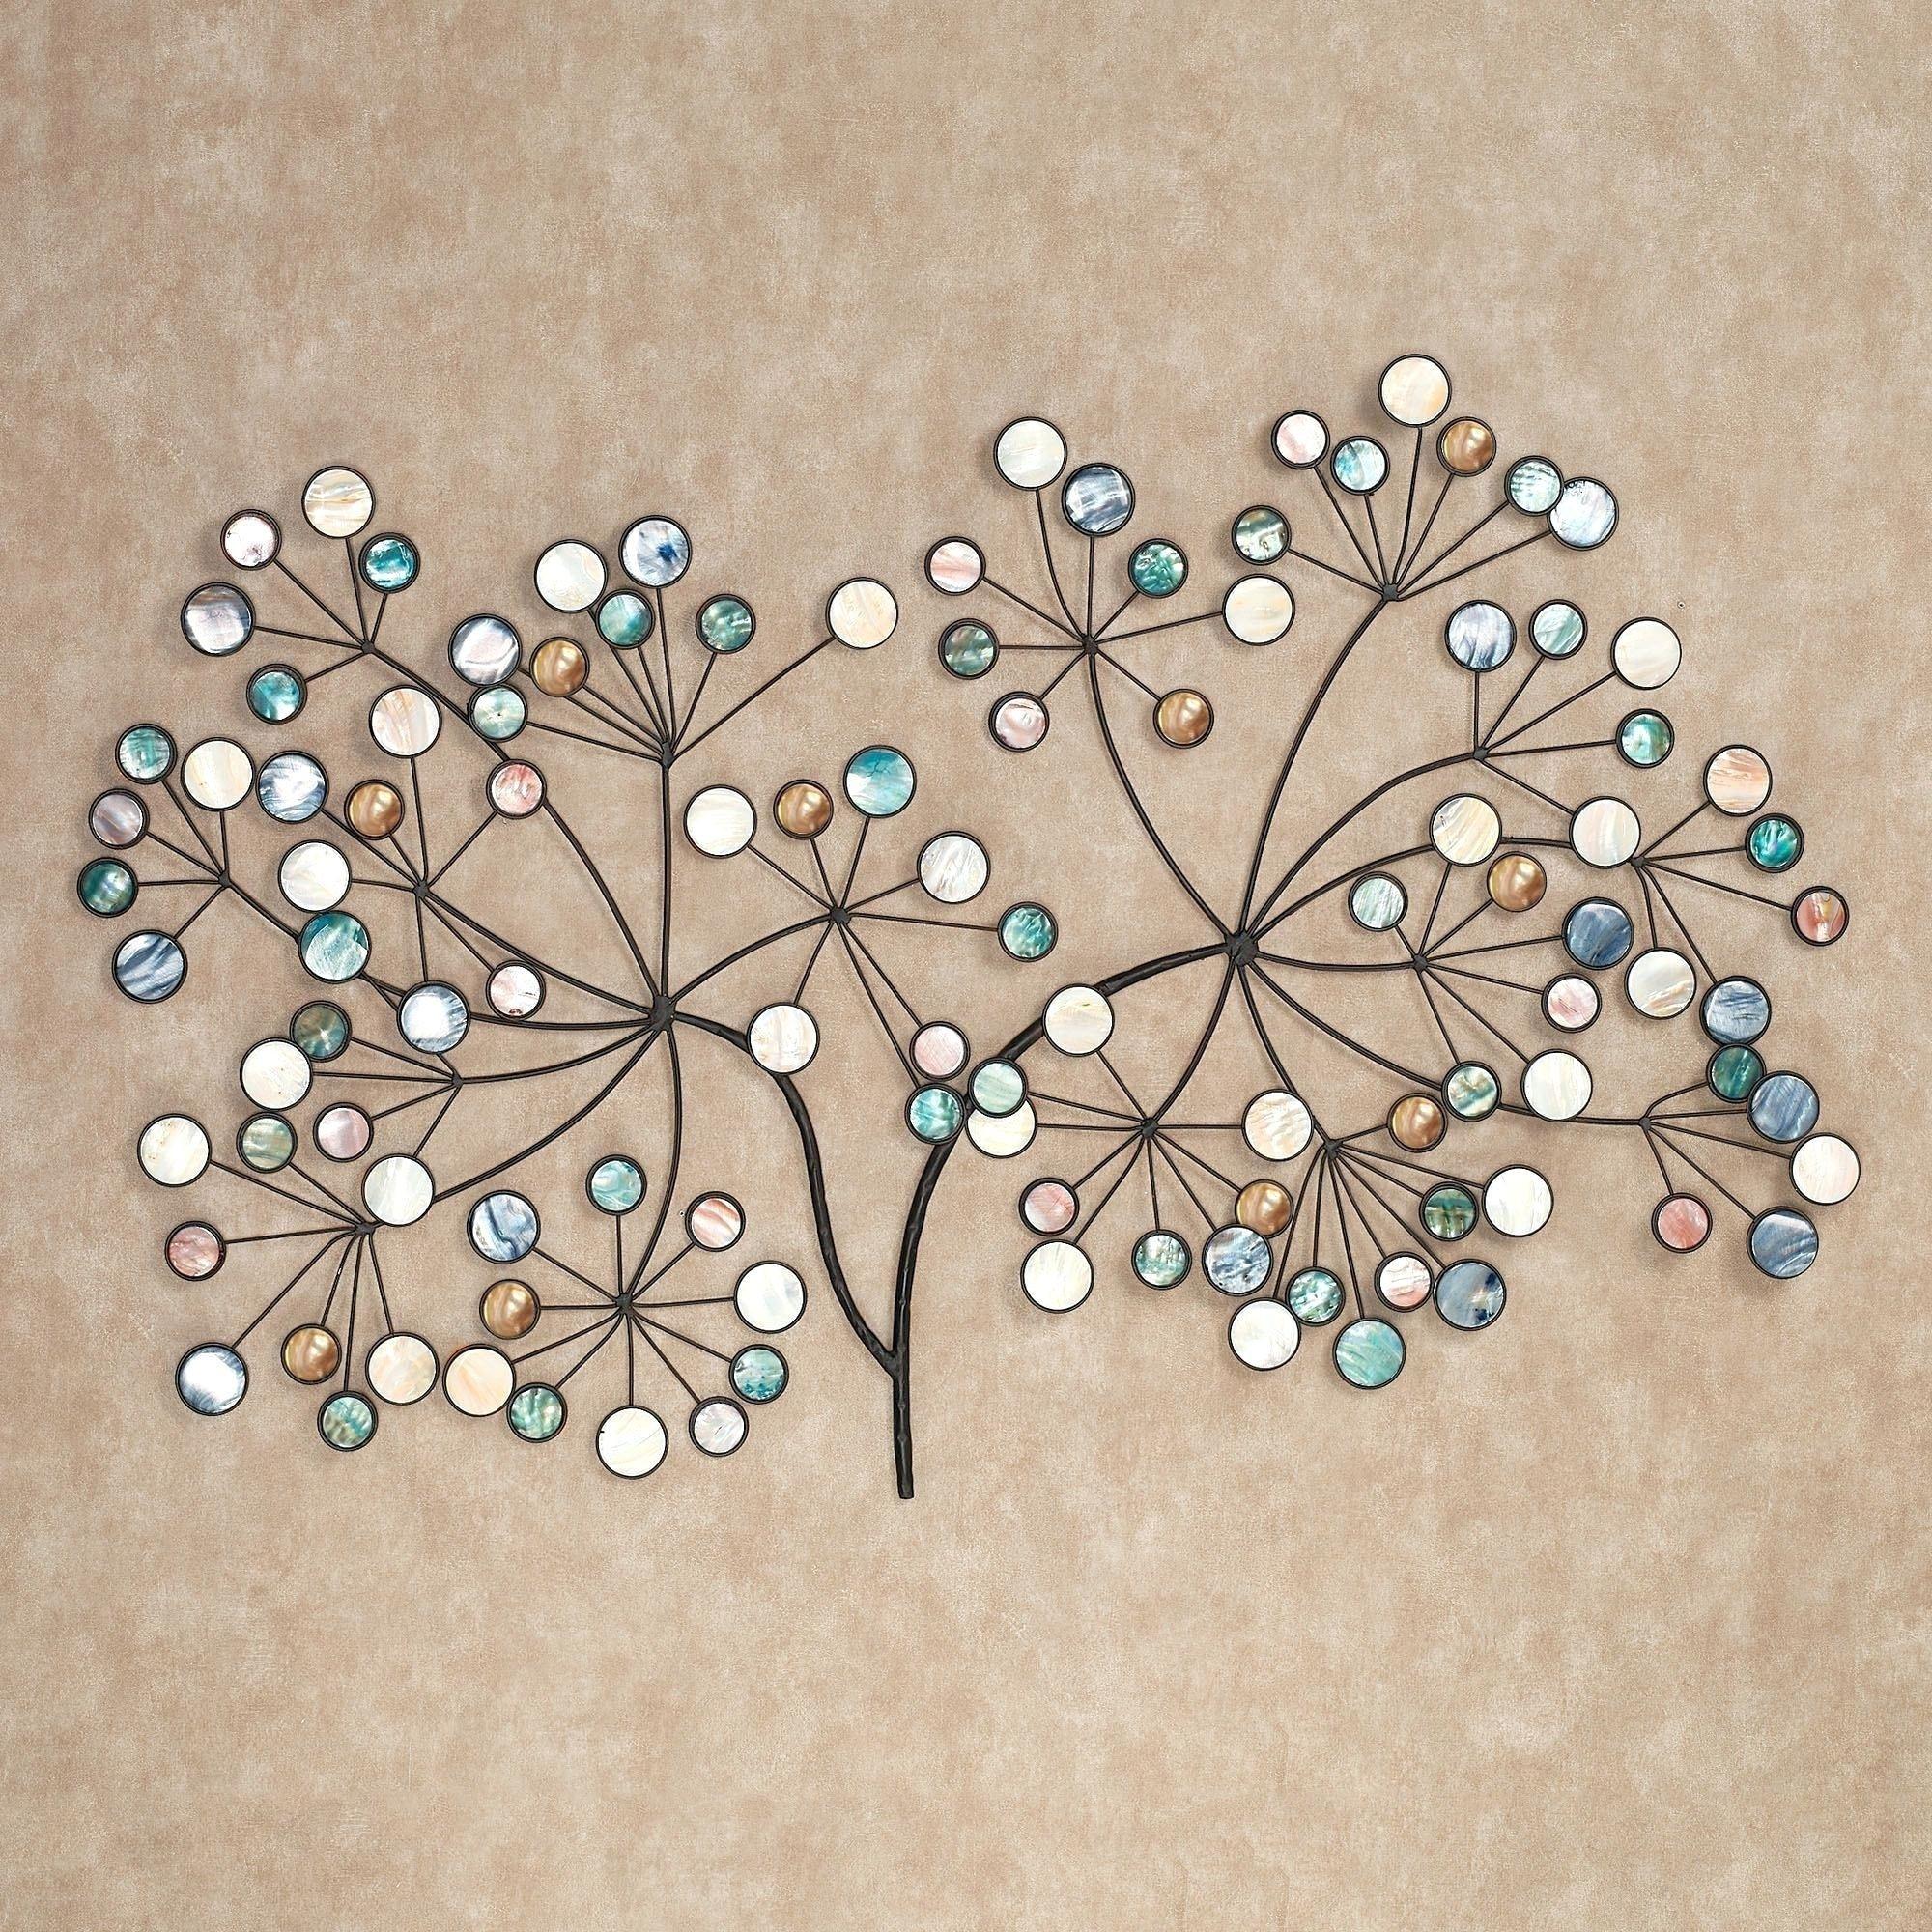 35 Fresh Wall Art Inspiration Of Mirror Mosaic Wall Art | Wall Art In Most Current Mirror Mosaic Wall Art (Gallery 19 of 20)